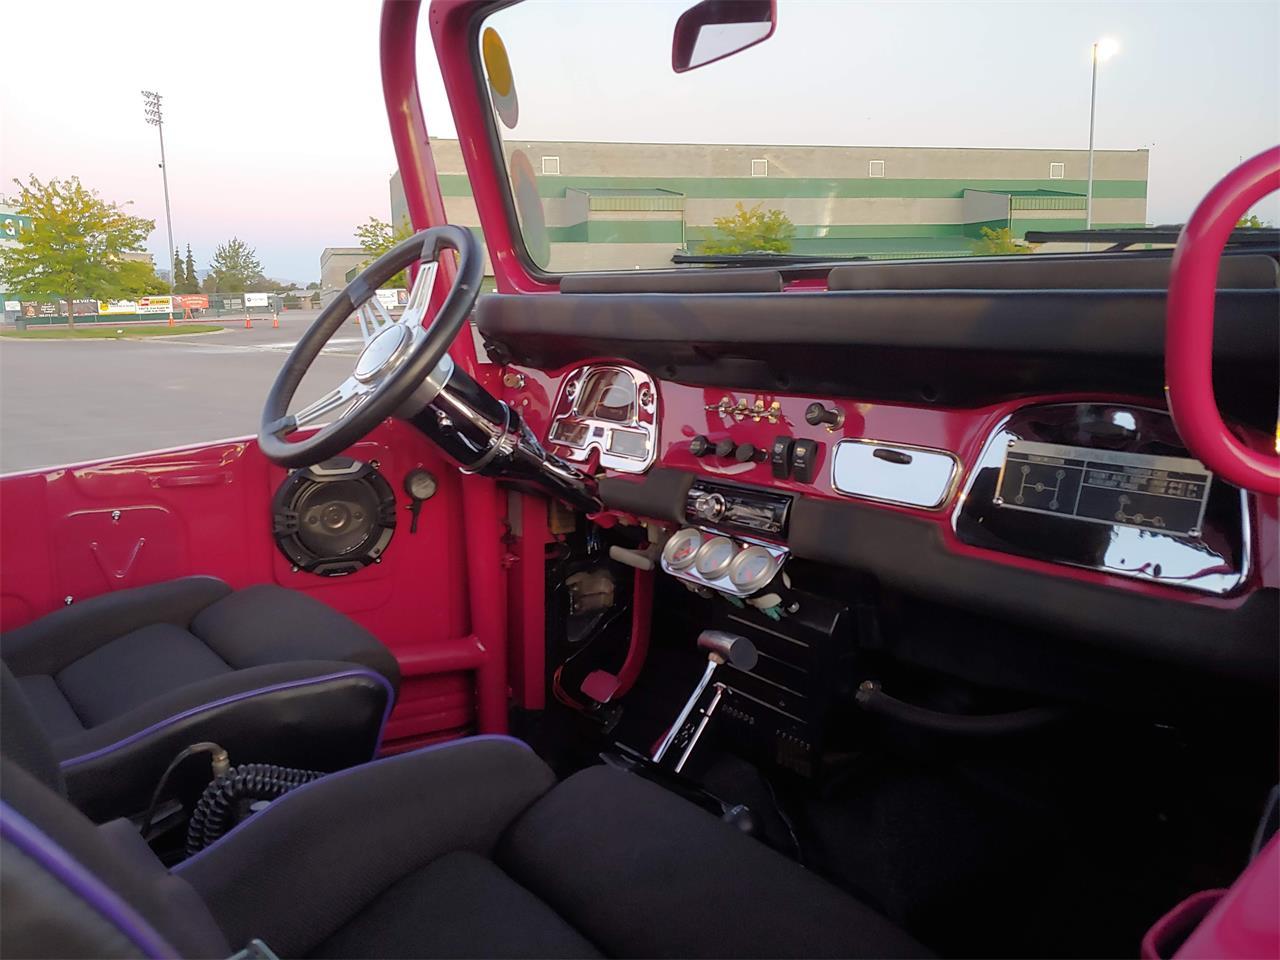 Large Picture of '73 Toyota Land Cruiser FJ40 - $85,000.00 - QYQV